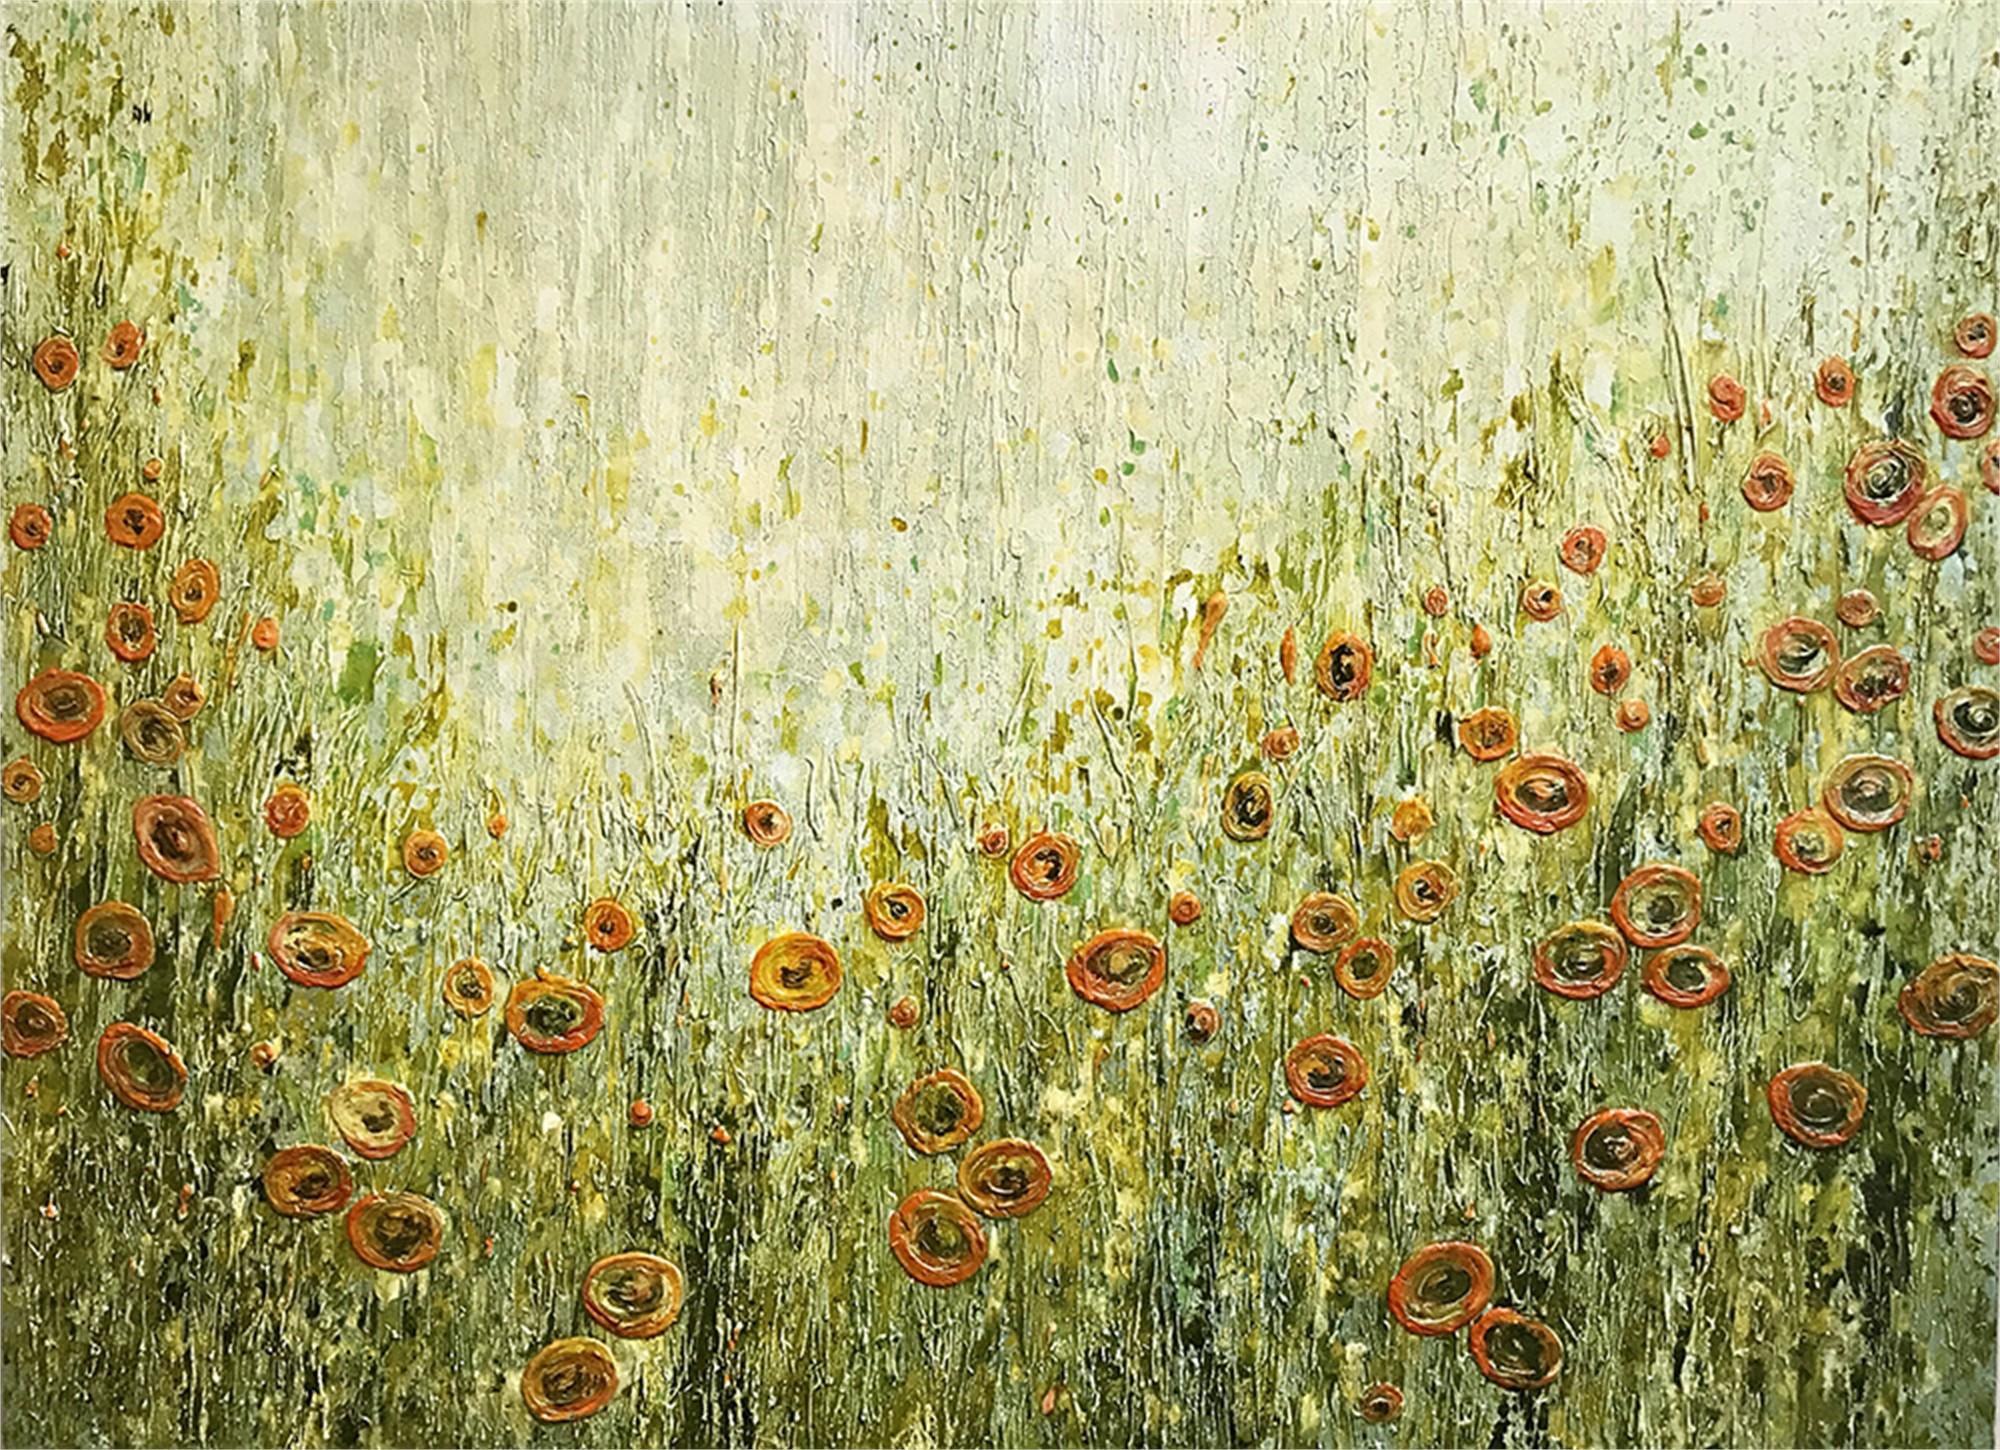 Orange Poppies by Susan Nuttall